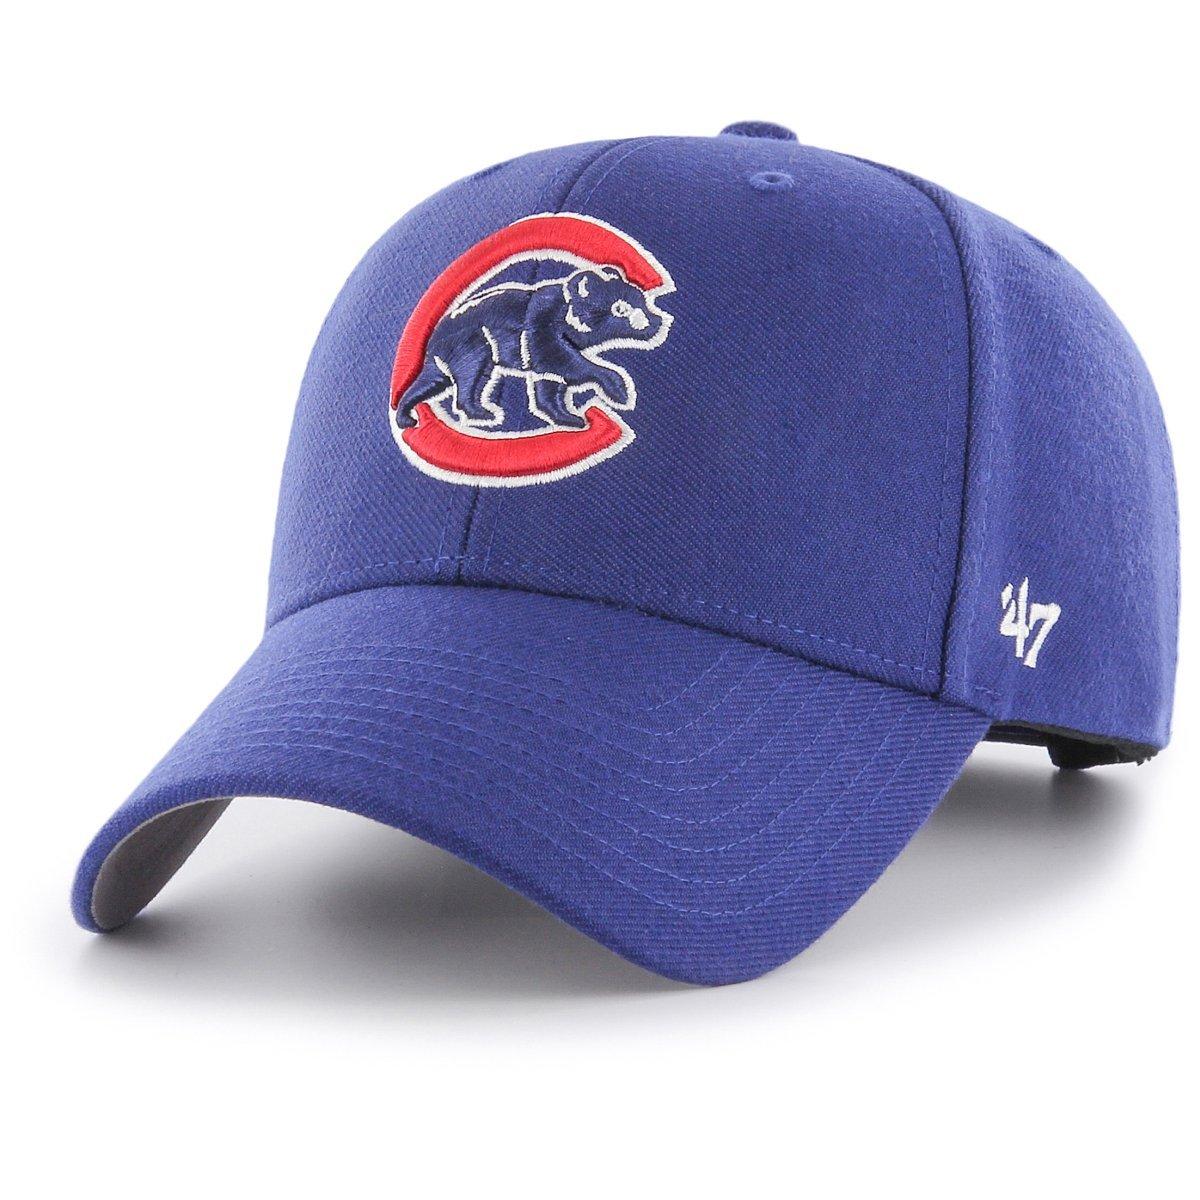 '47 MLB Chicago Cubs '47 MVP Cap 47 Brand